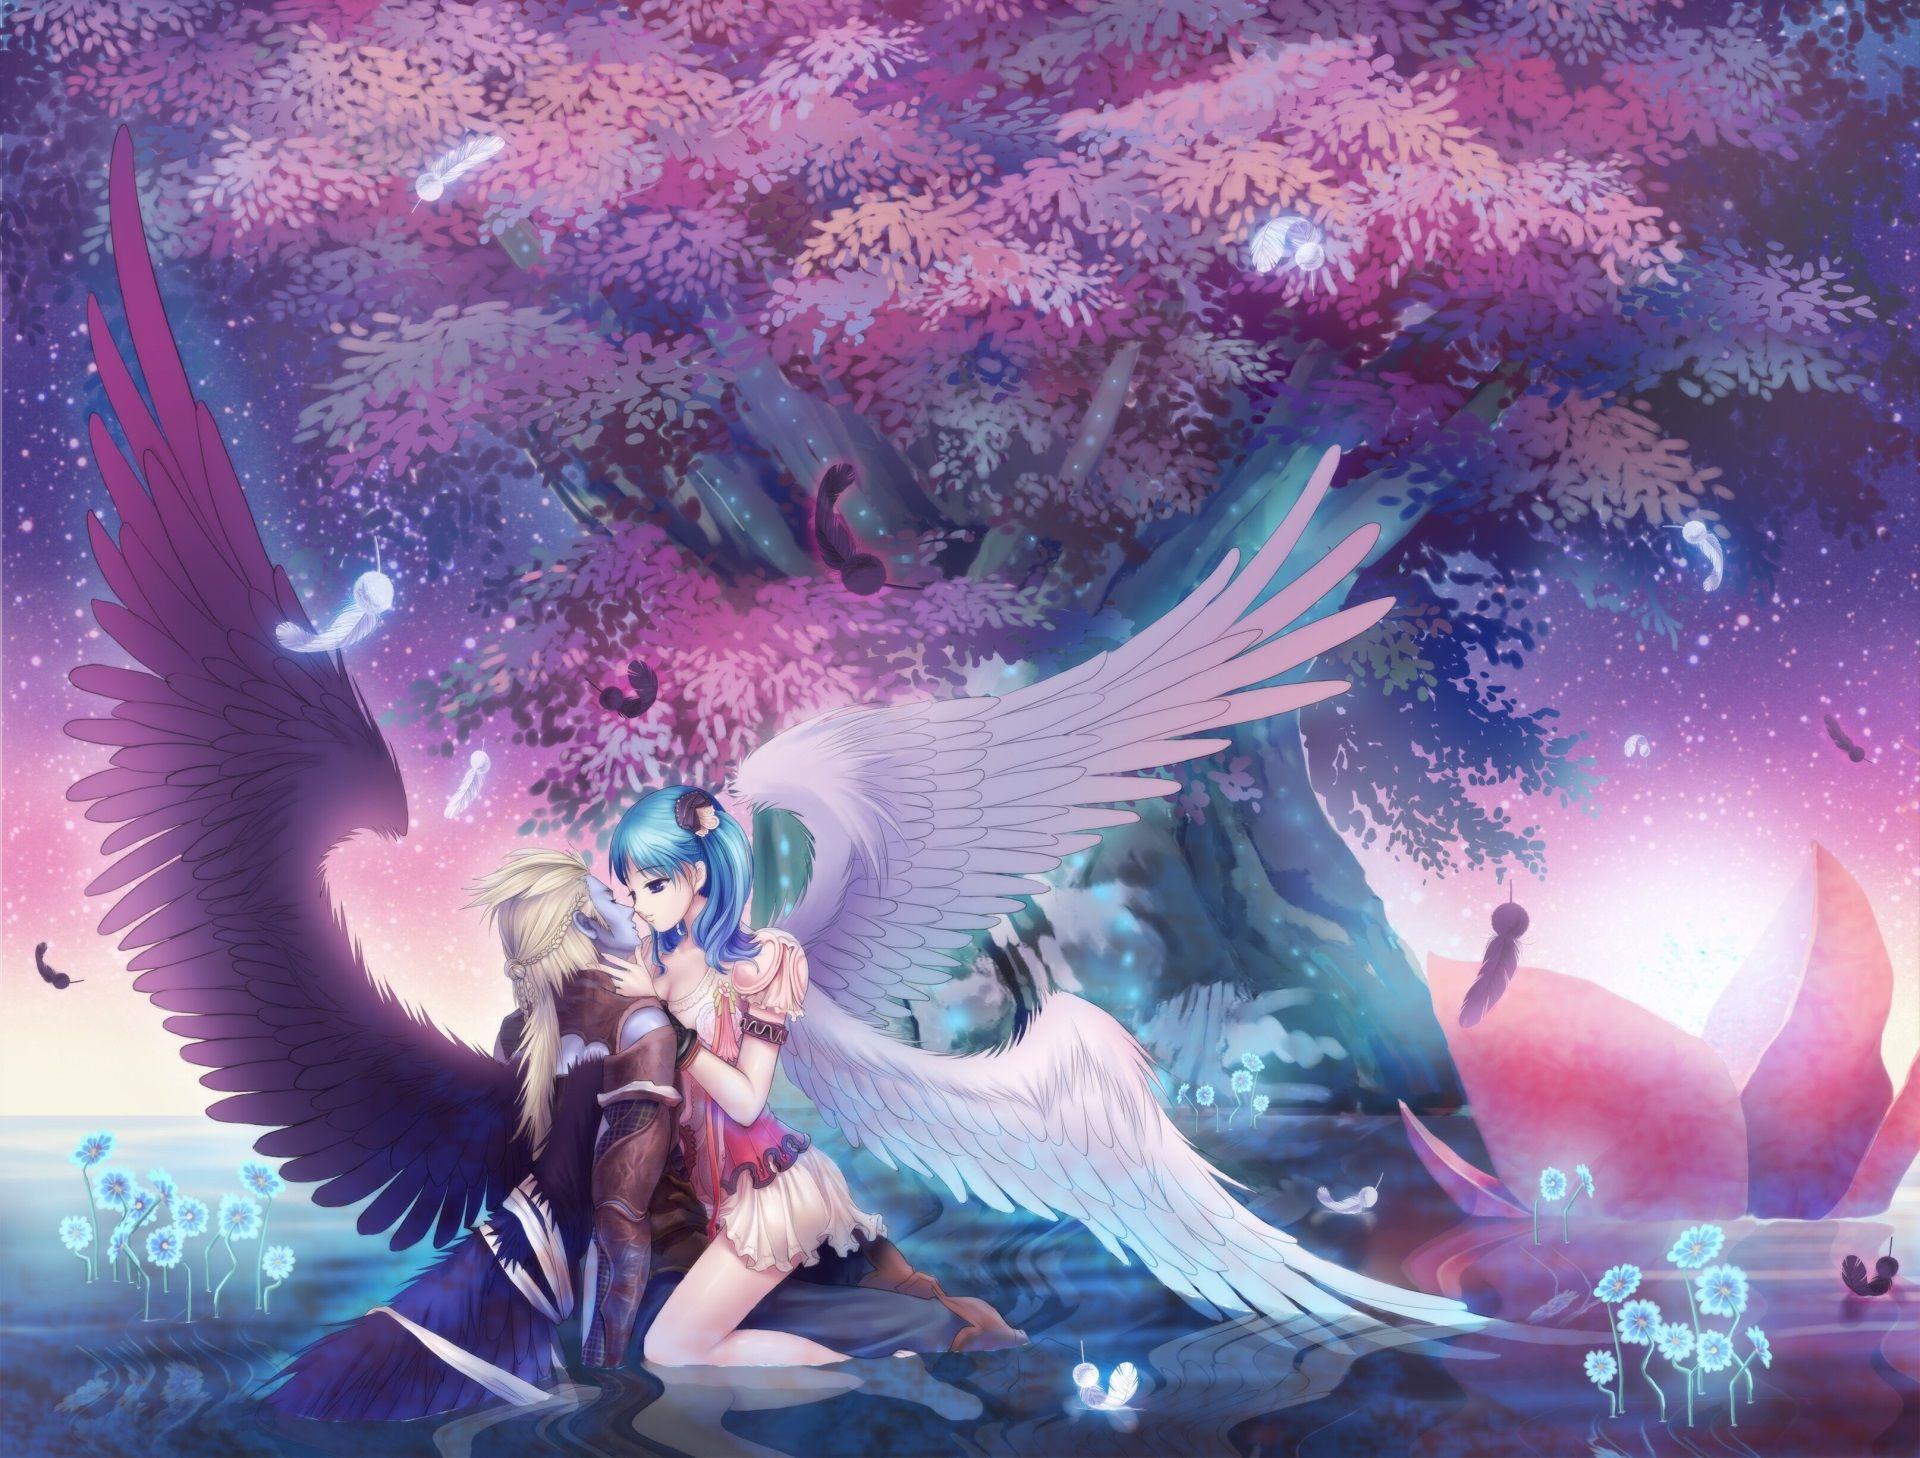 Couple Anime Wallpaper Hd